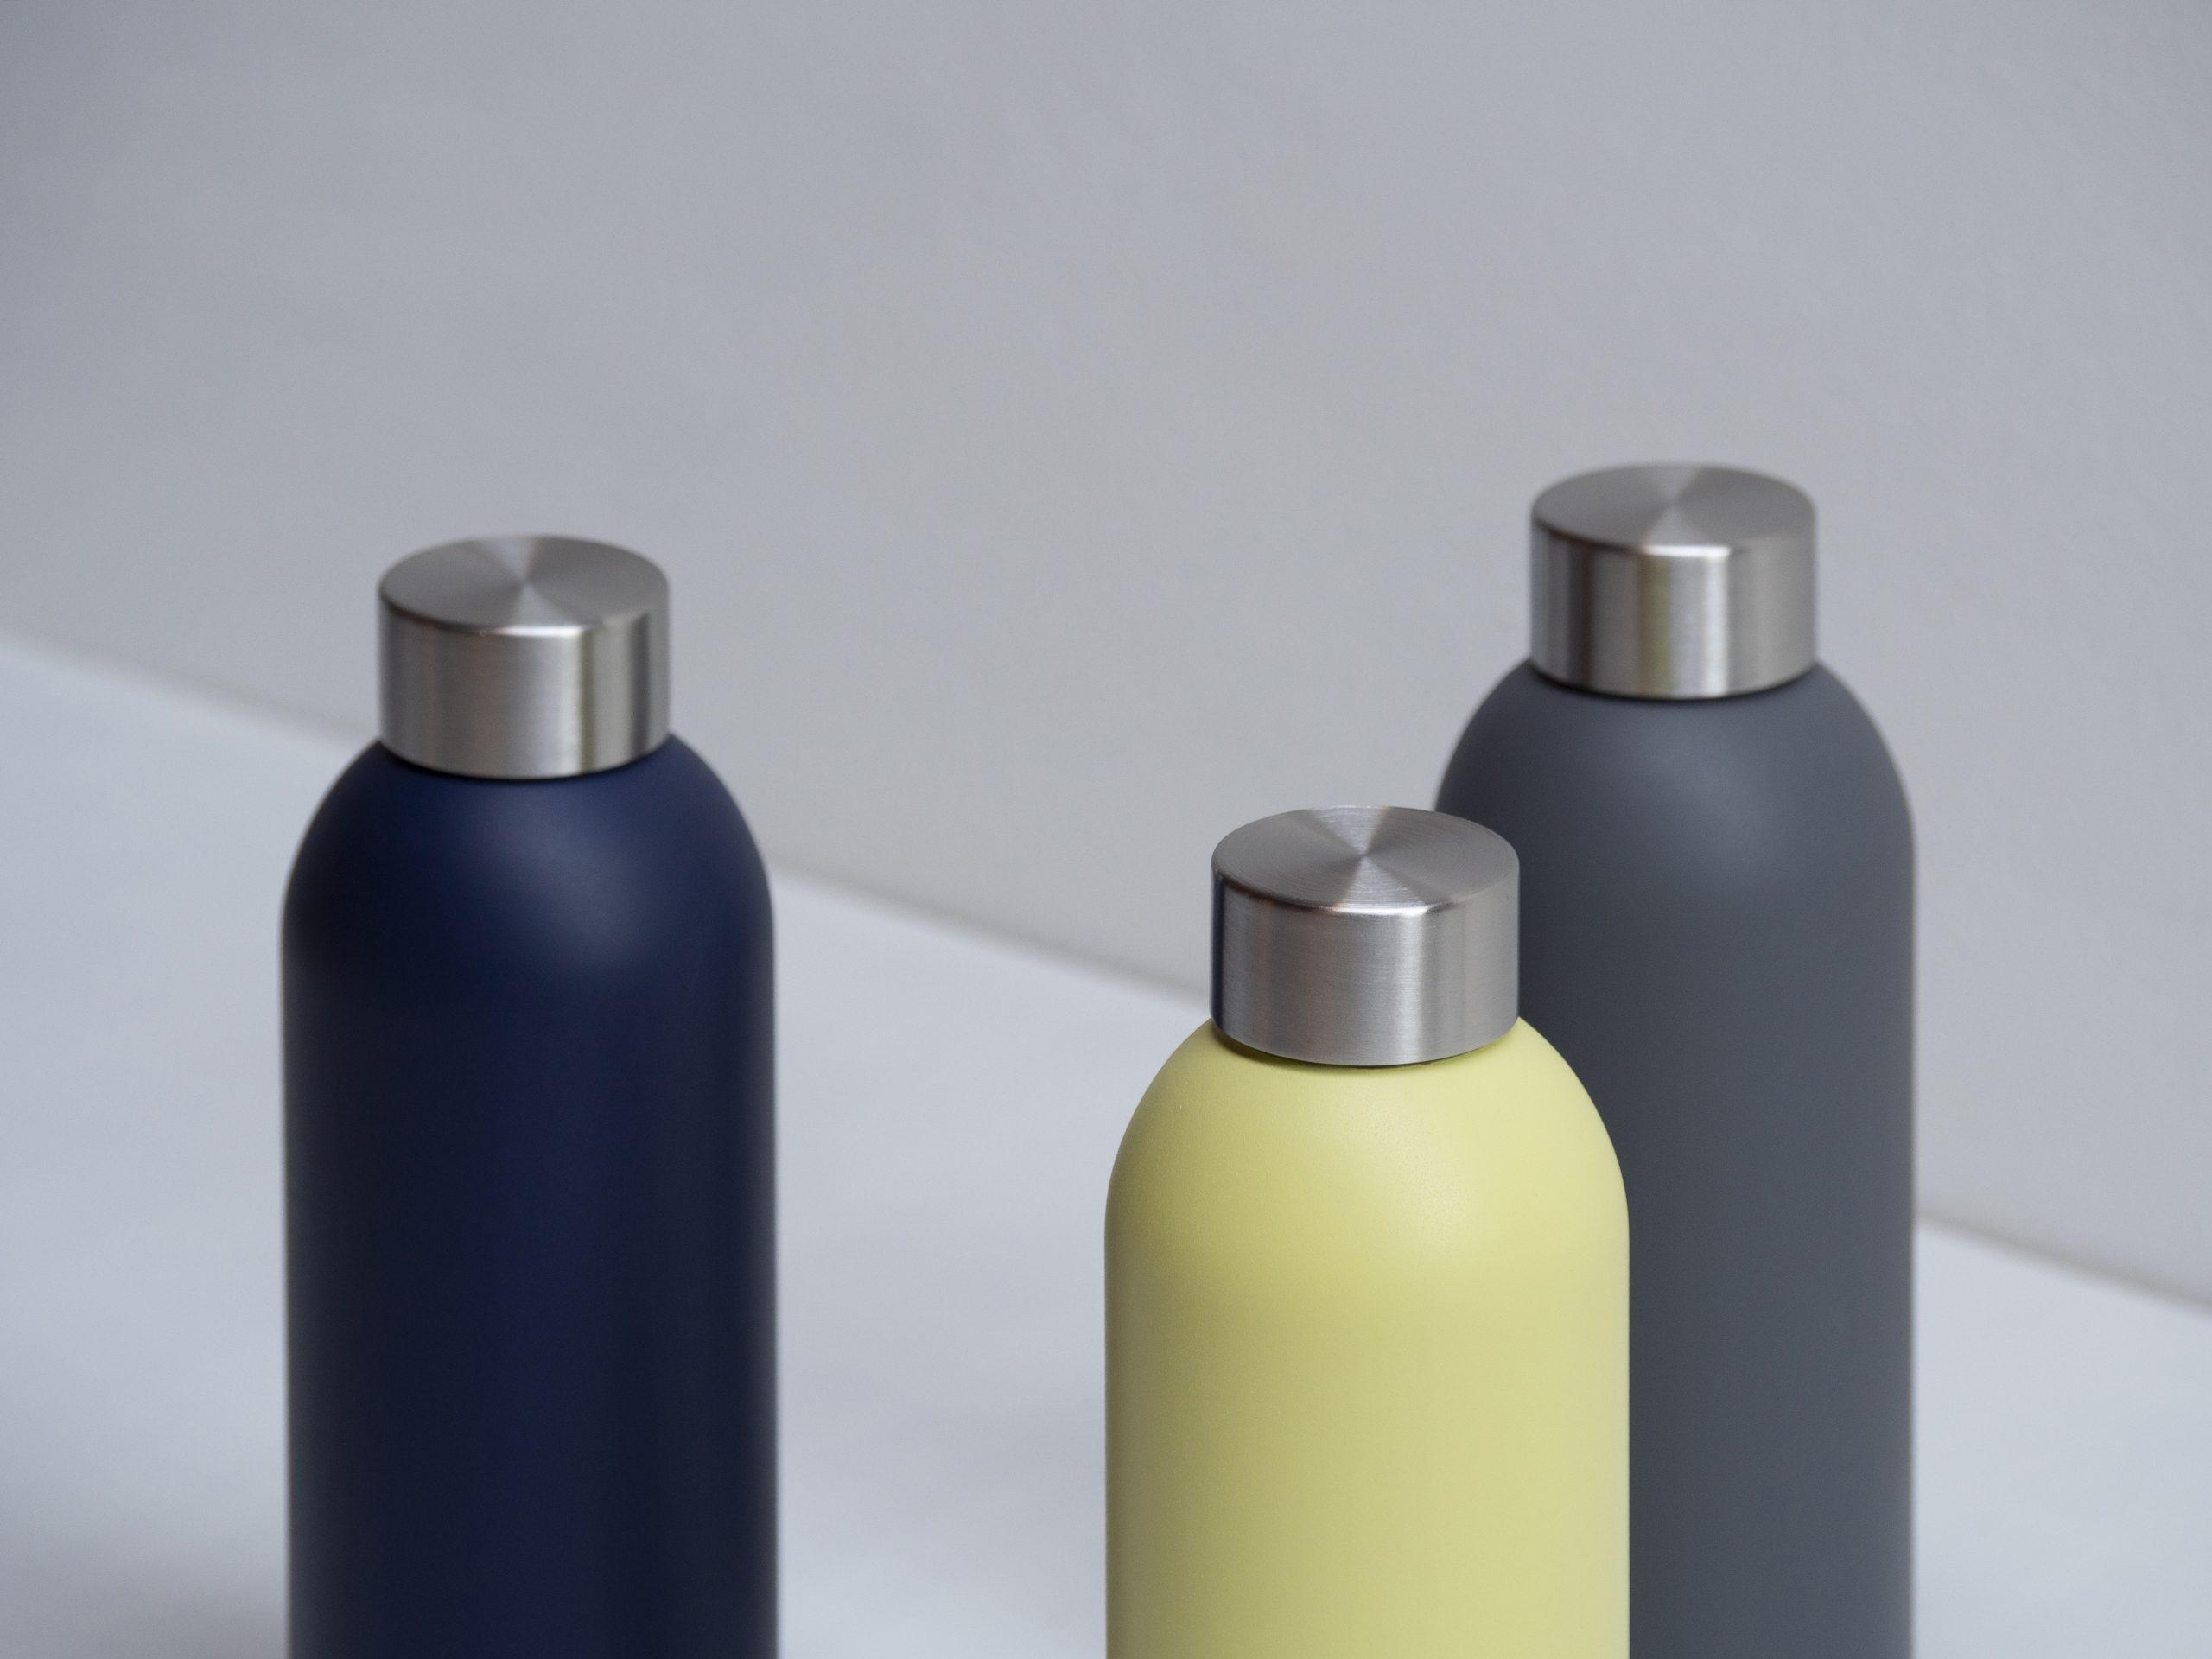 Detail of Keep Cool bottle by Debiasi Sandri for Stelton